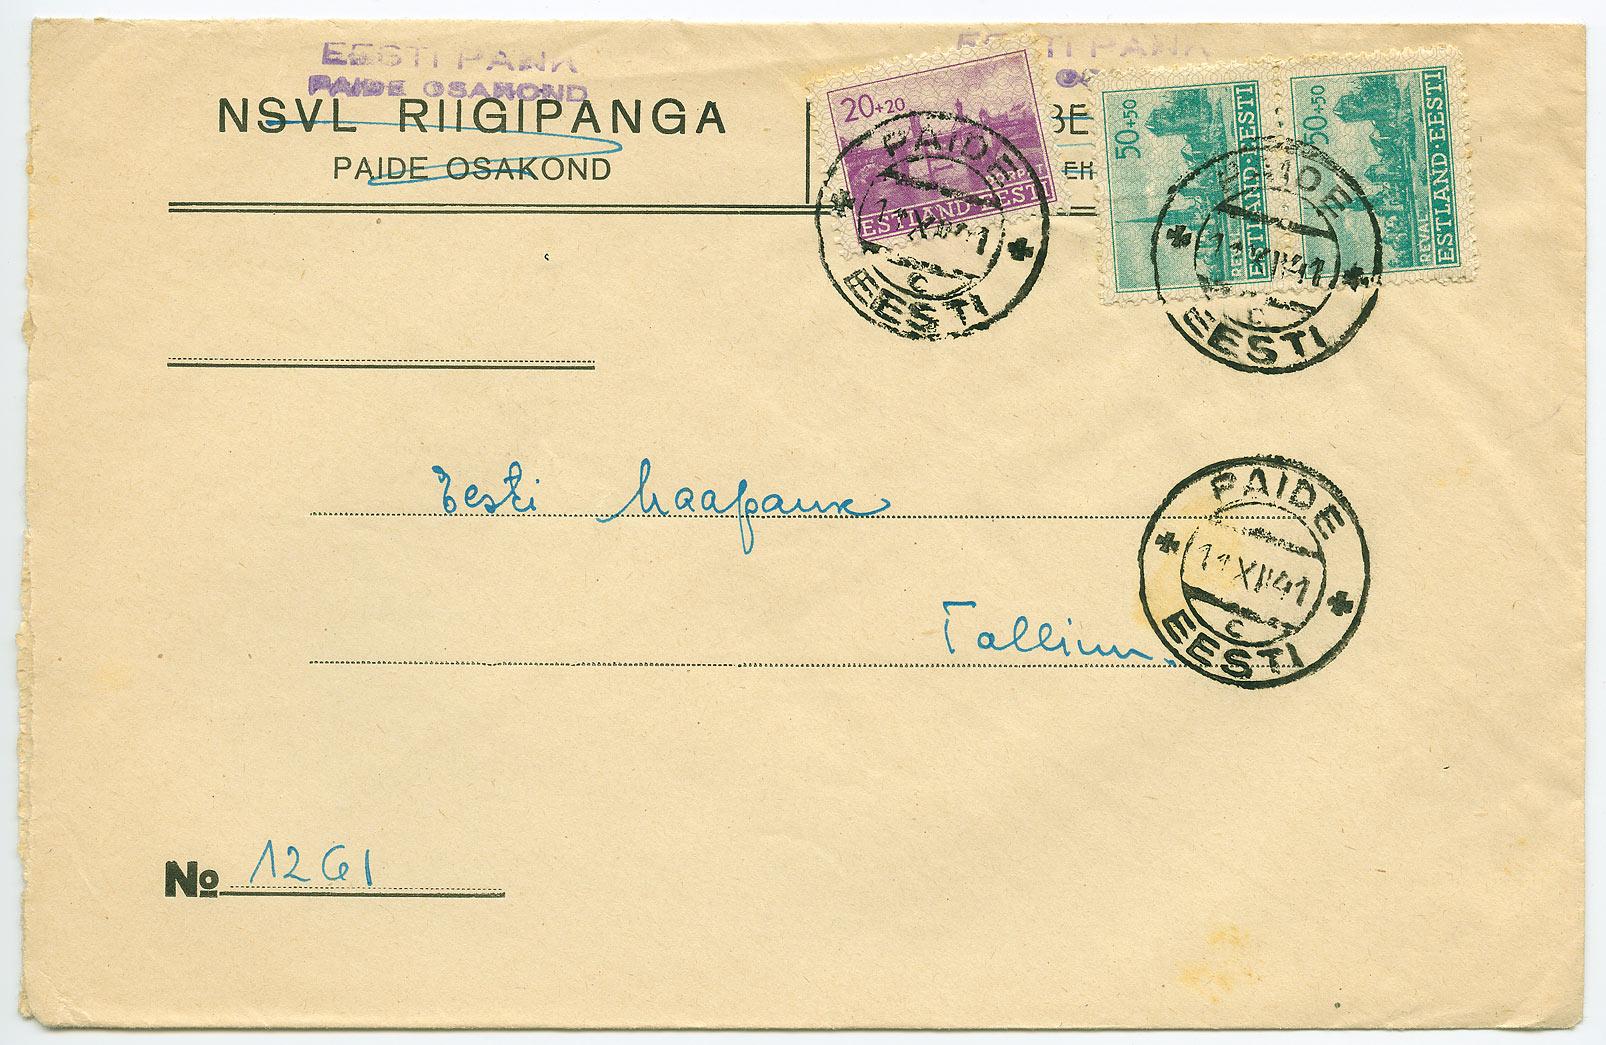 0367-NSVL-Riigipanga-Paide-